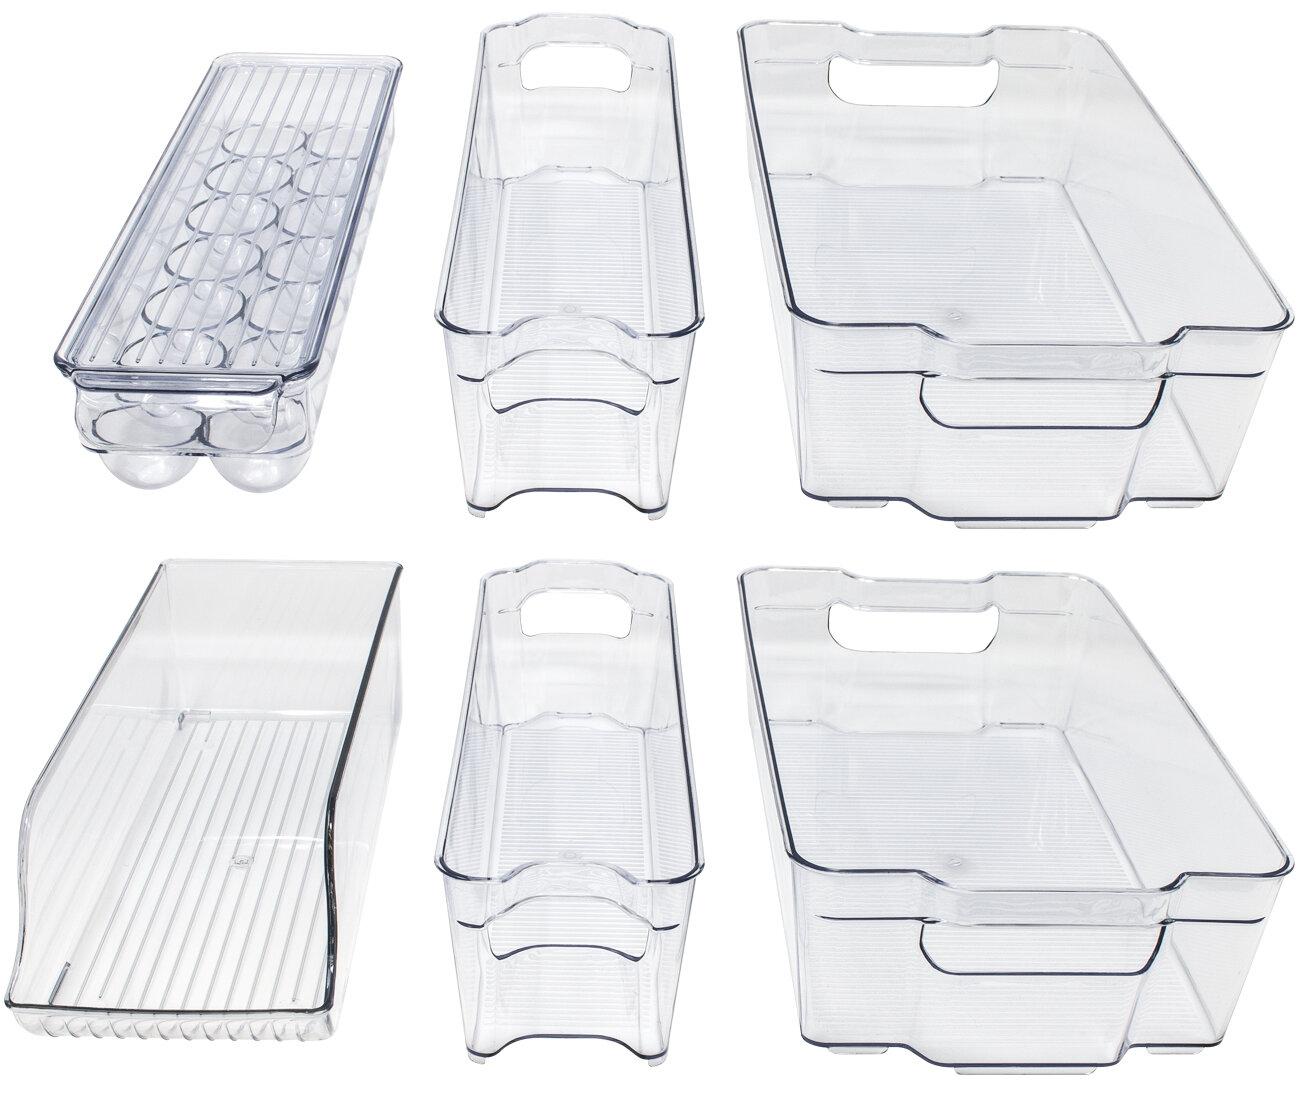 Rebrilliant Benefield Refrigerator and Freezer Organizer Bins Set of 6